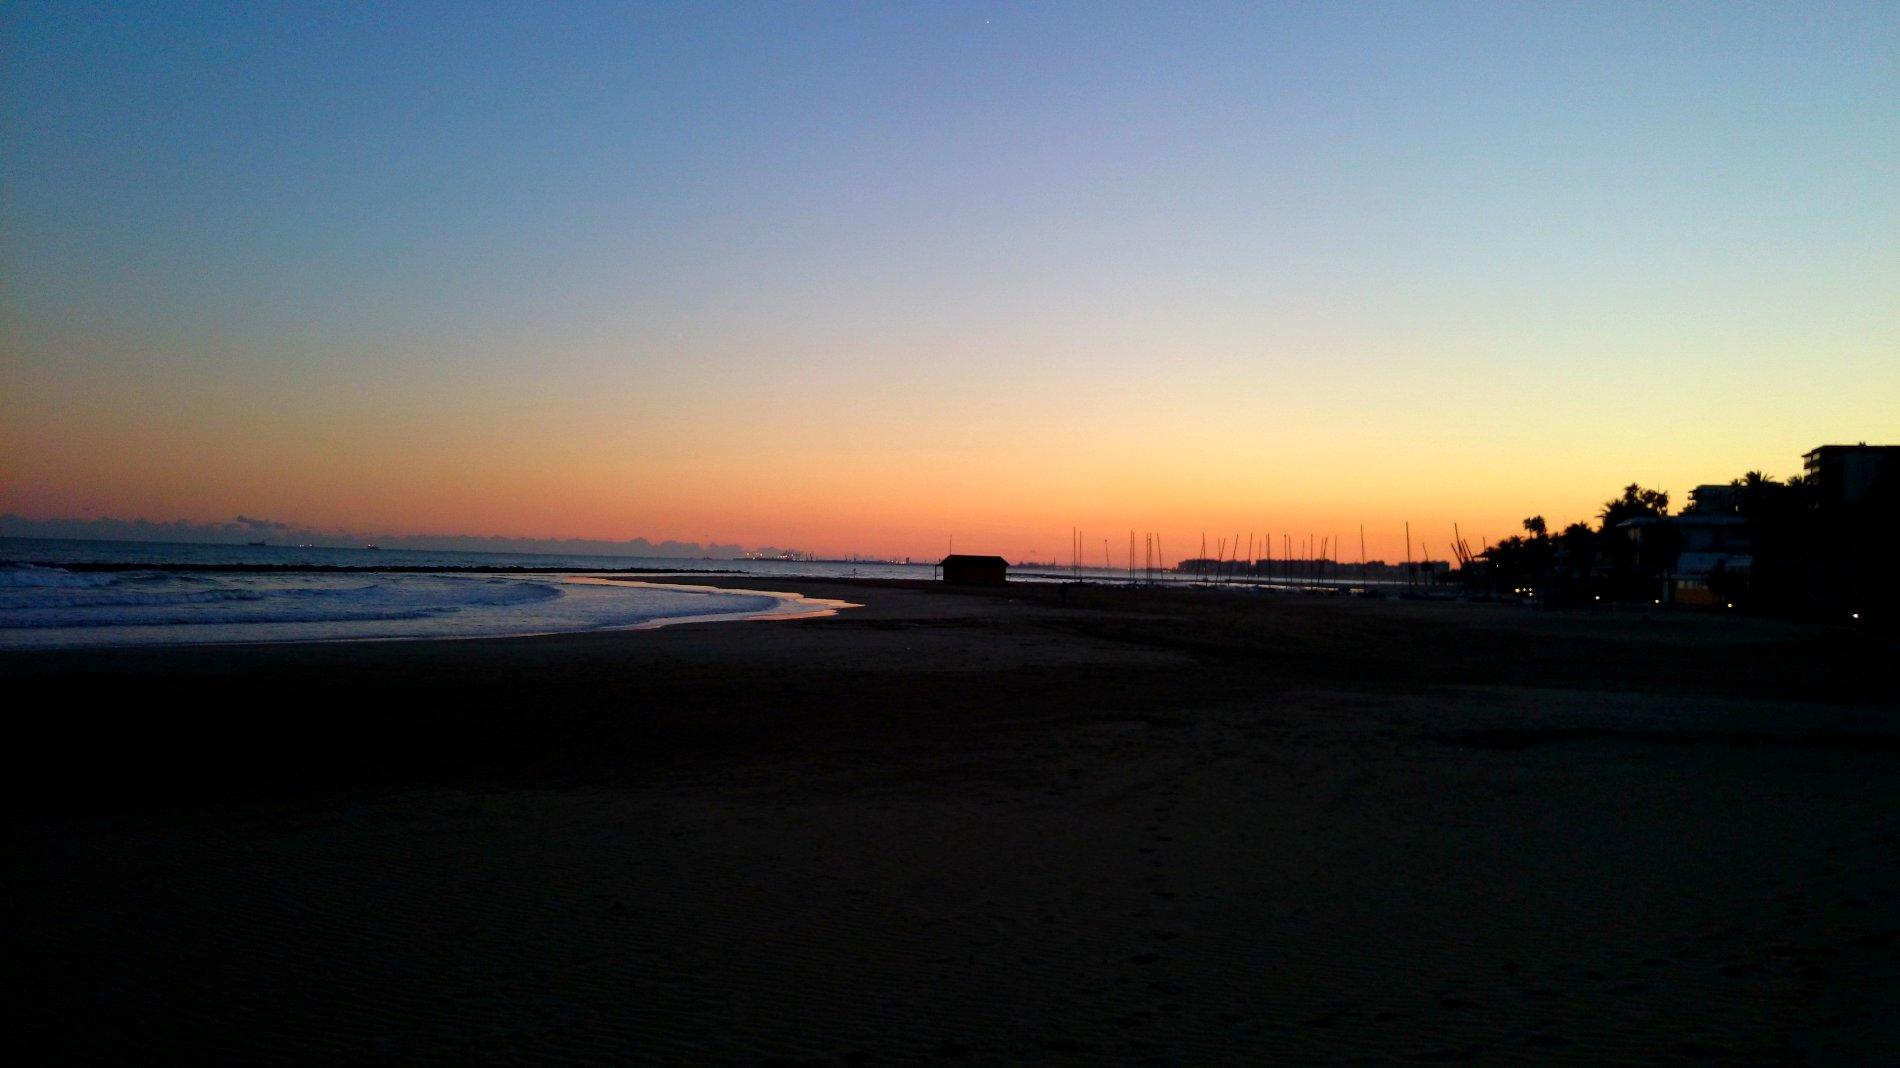 Playa noche